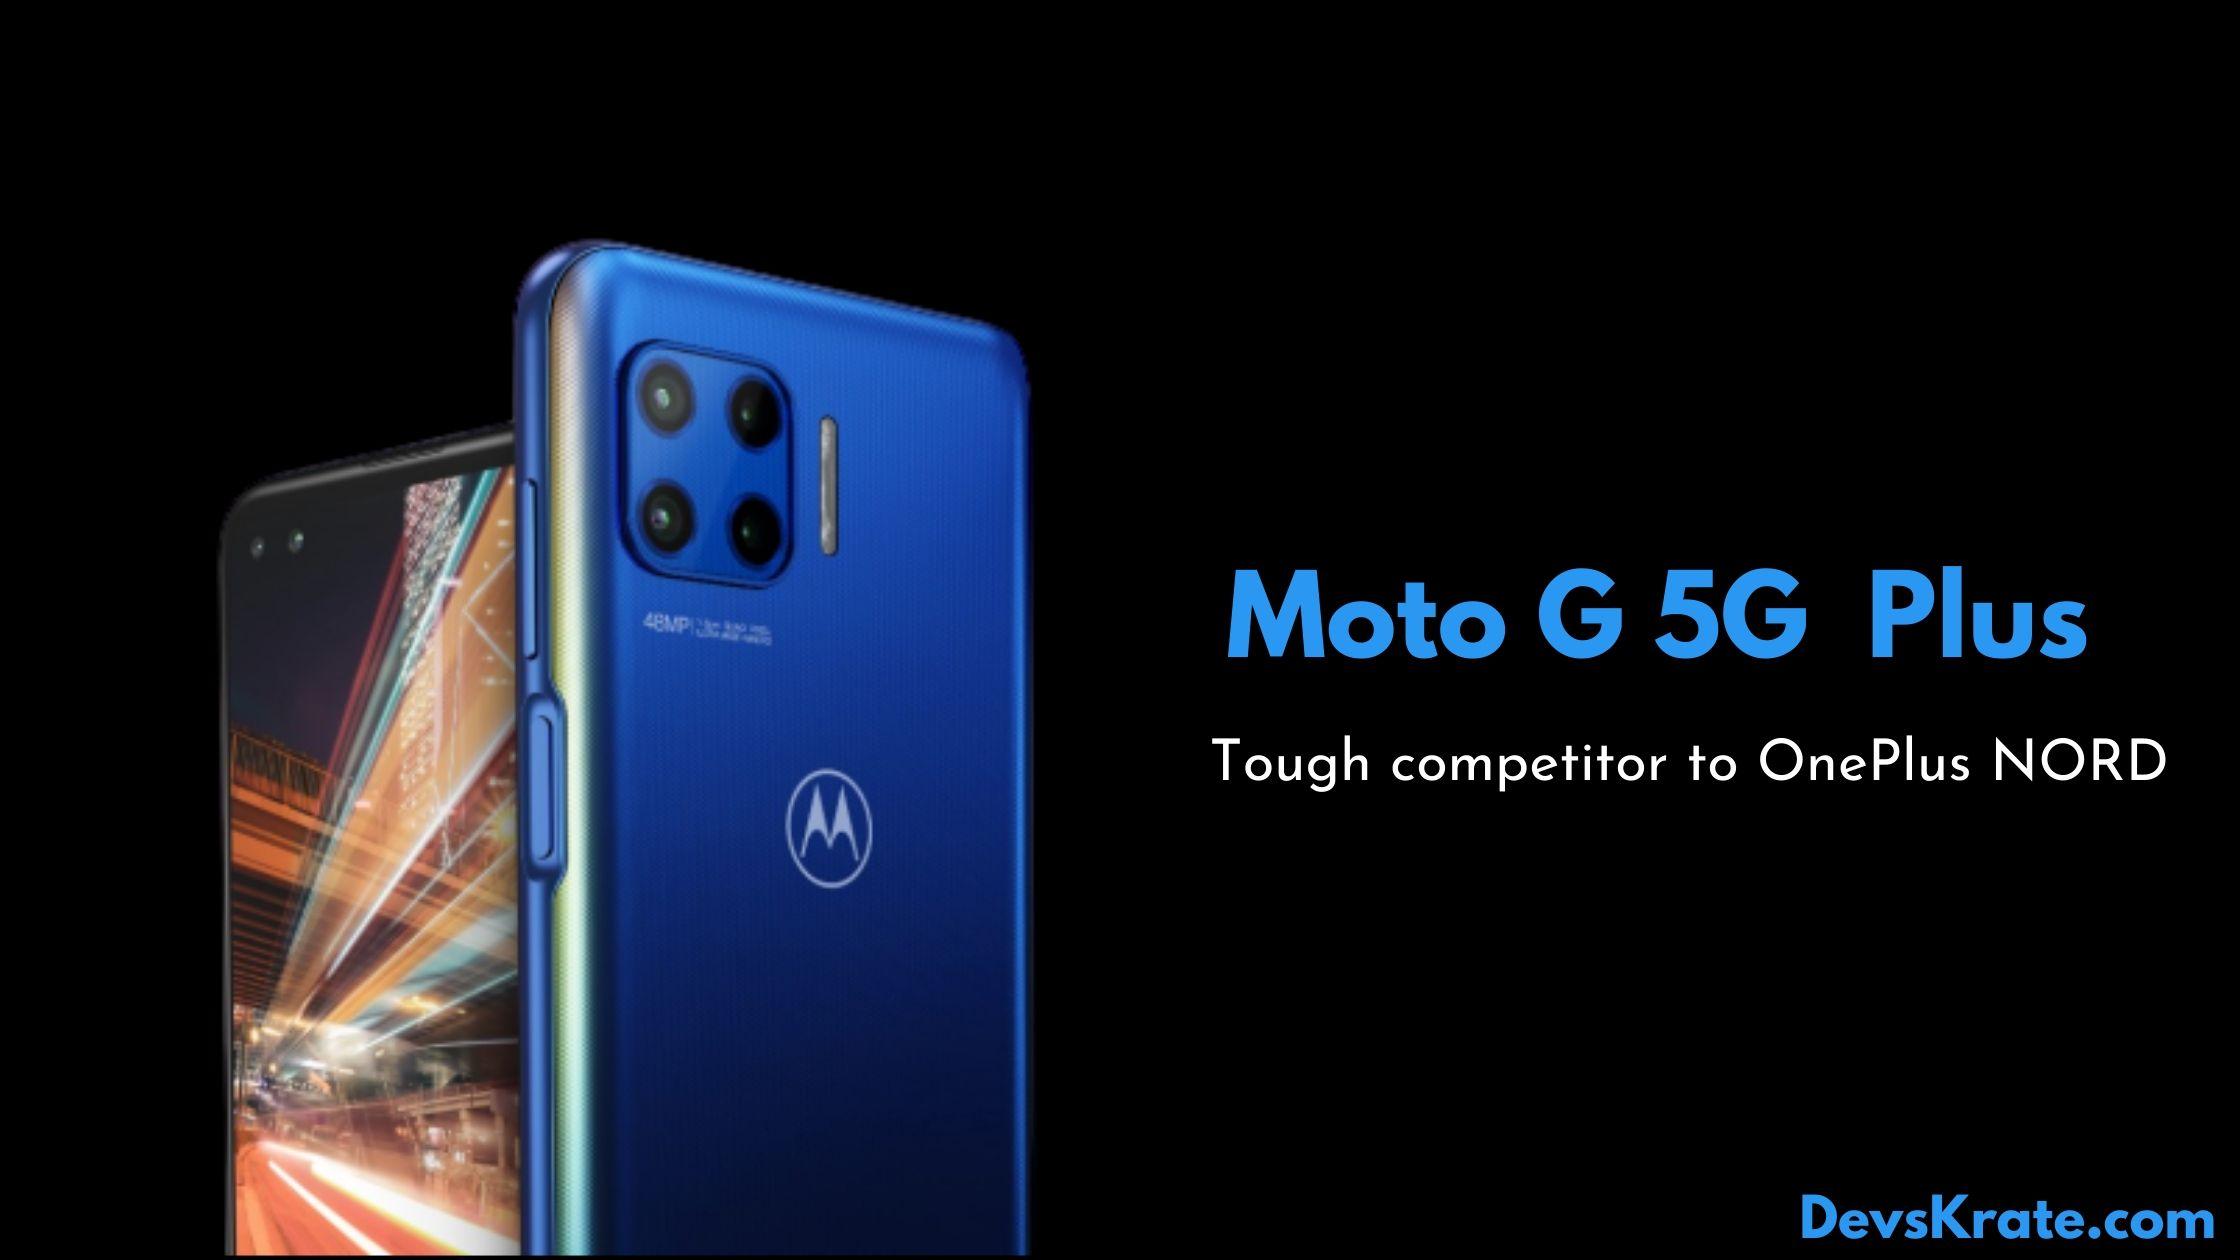 Moto G 5G Plus Specs and Price